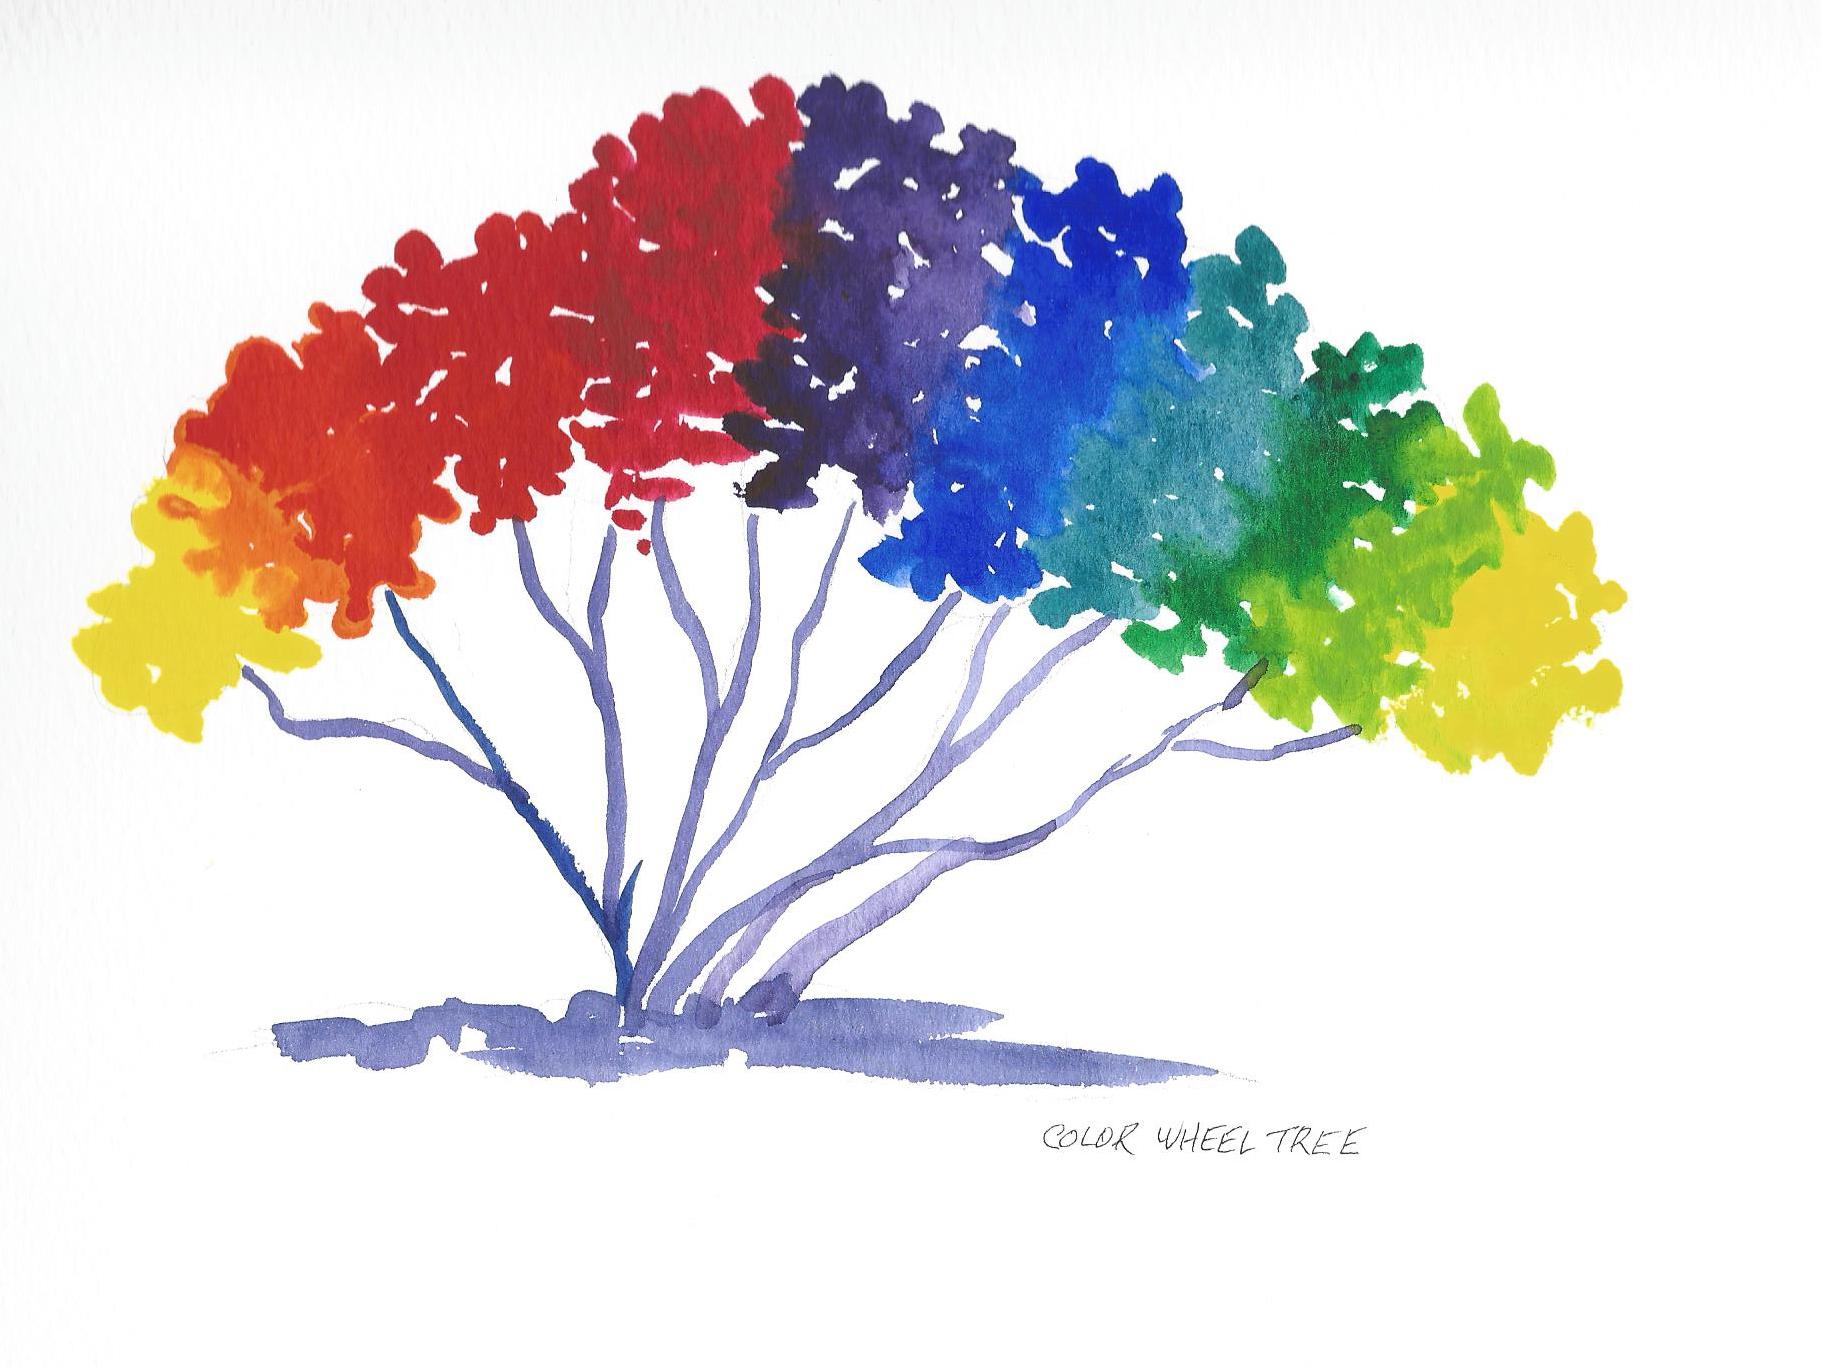 1821x1367 The Color Wheel Tree Stafford Artworks